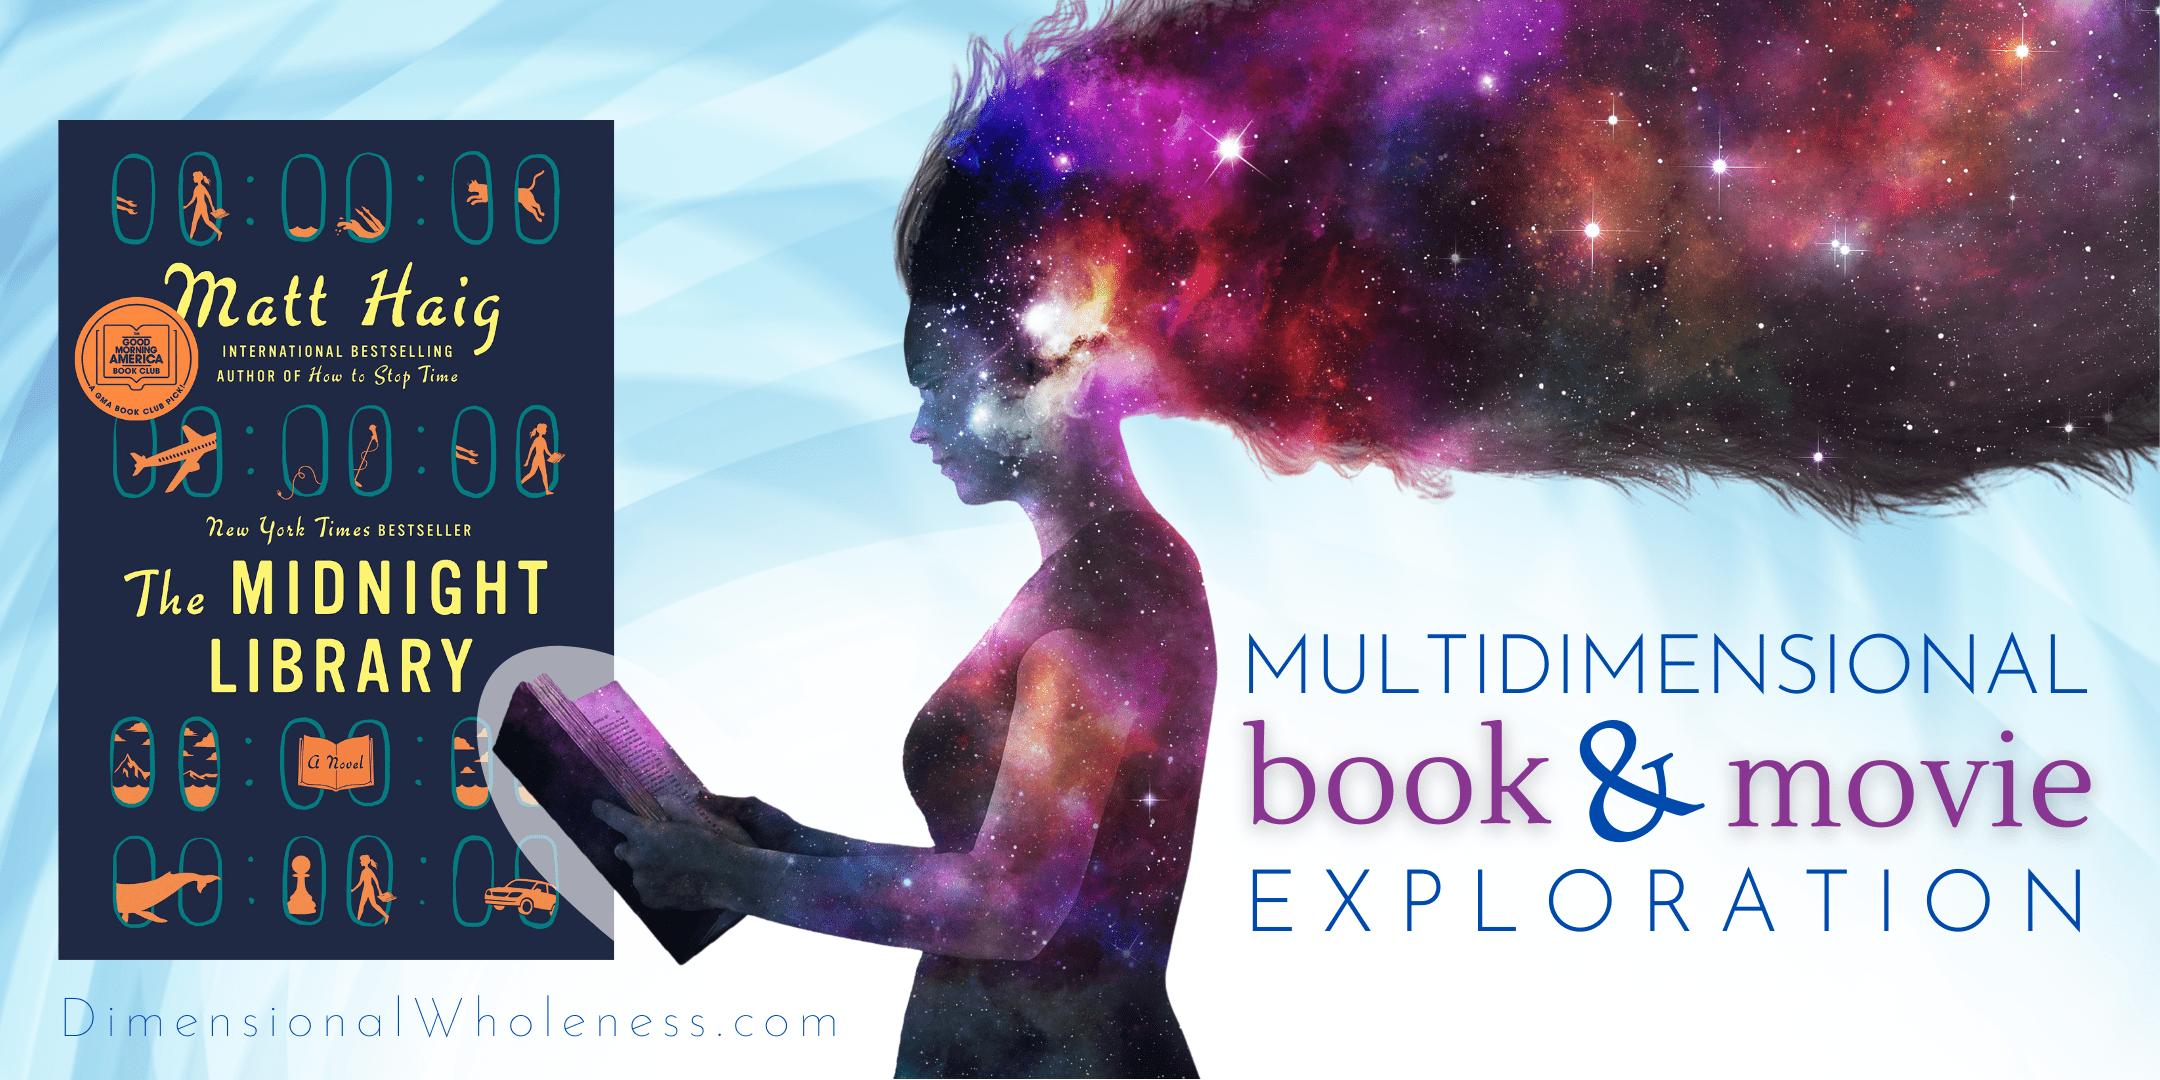 Multidimensional Book & Movie Exploration: The Midnight Library